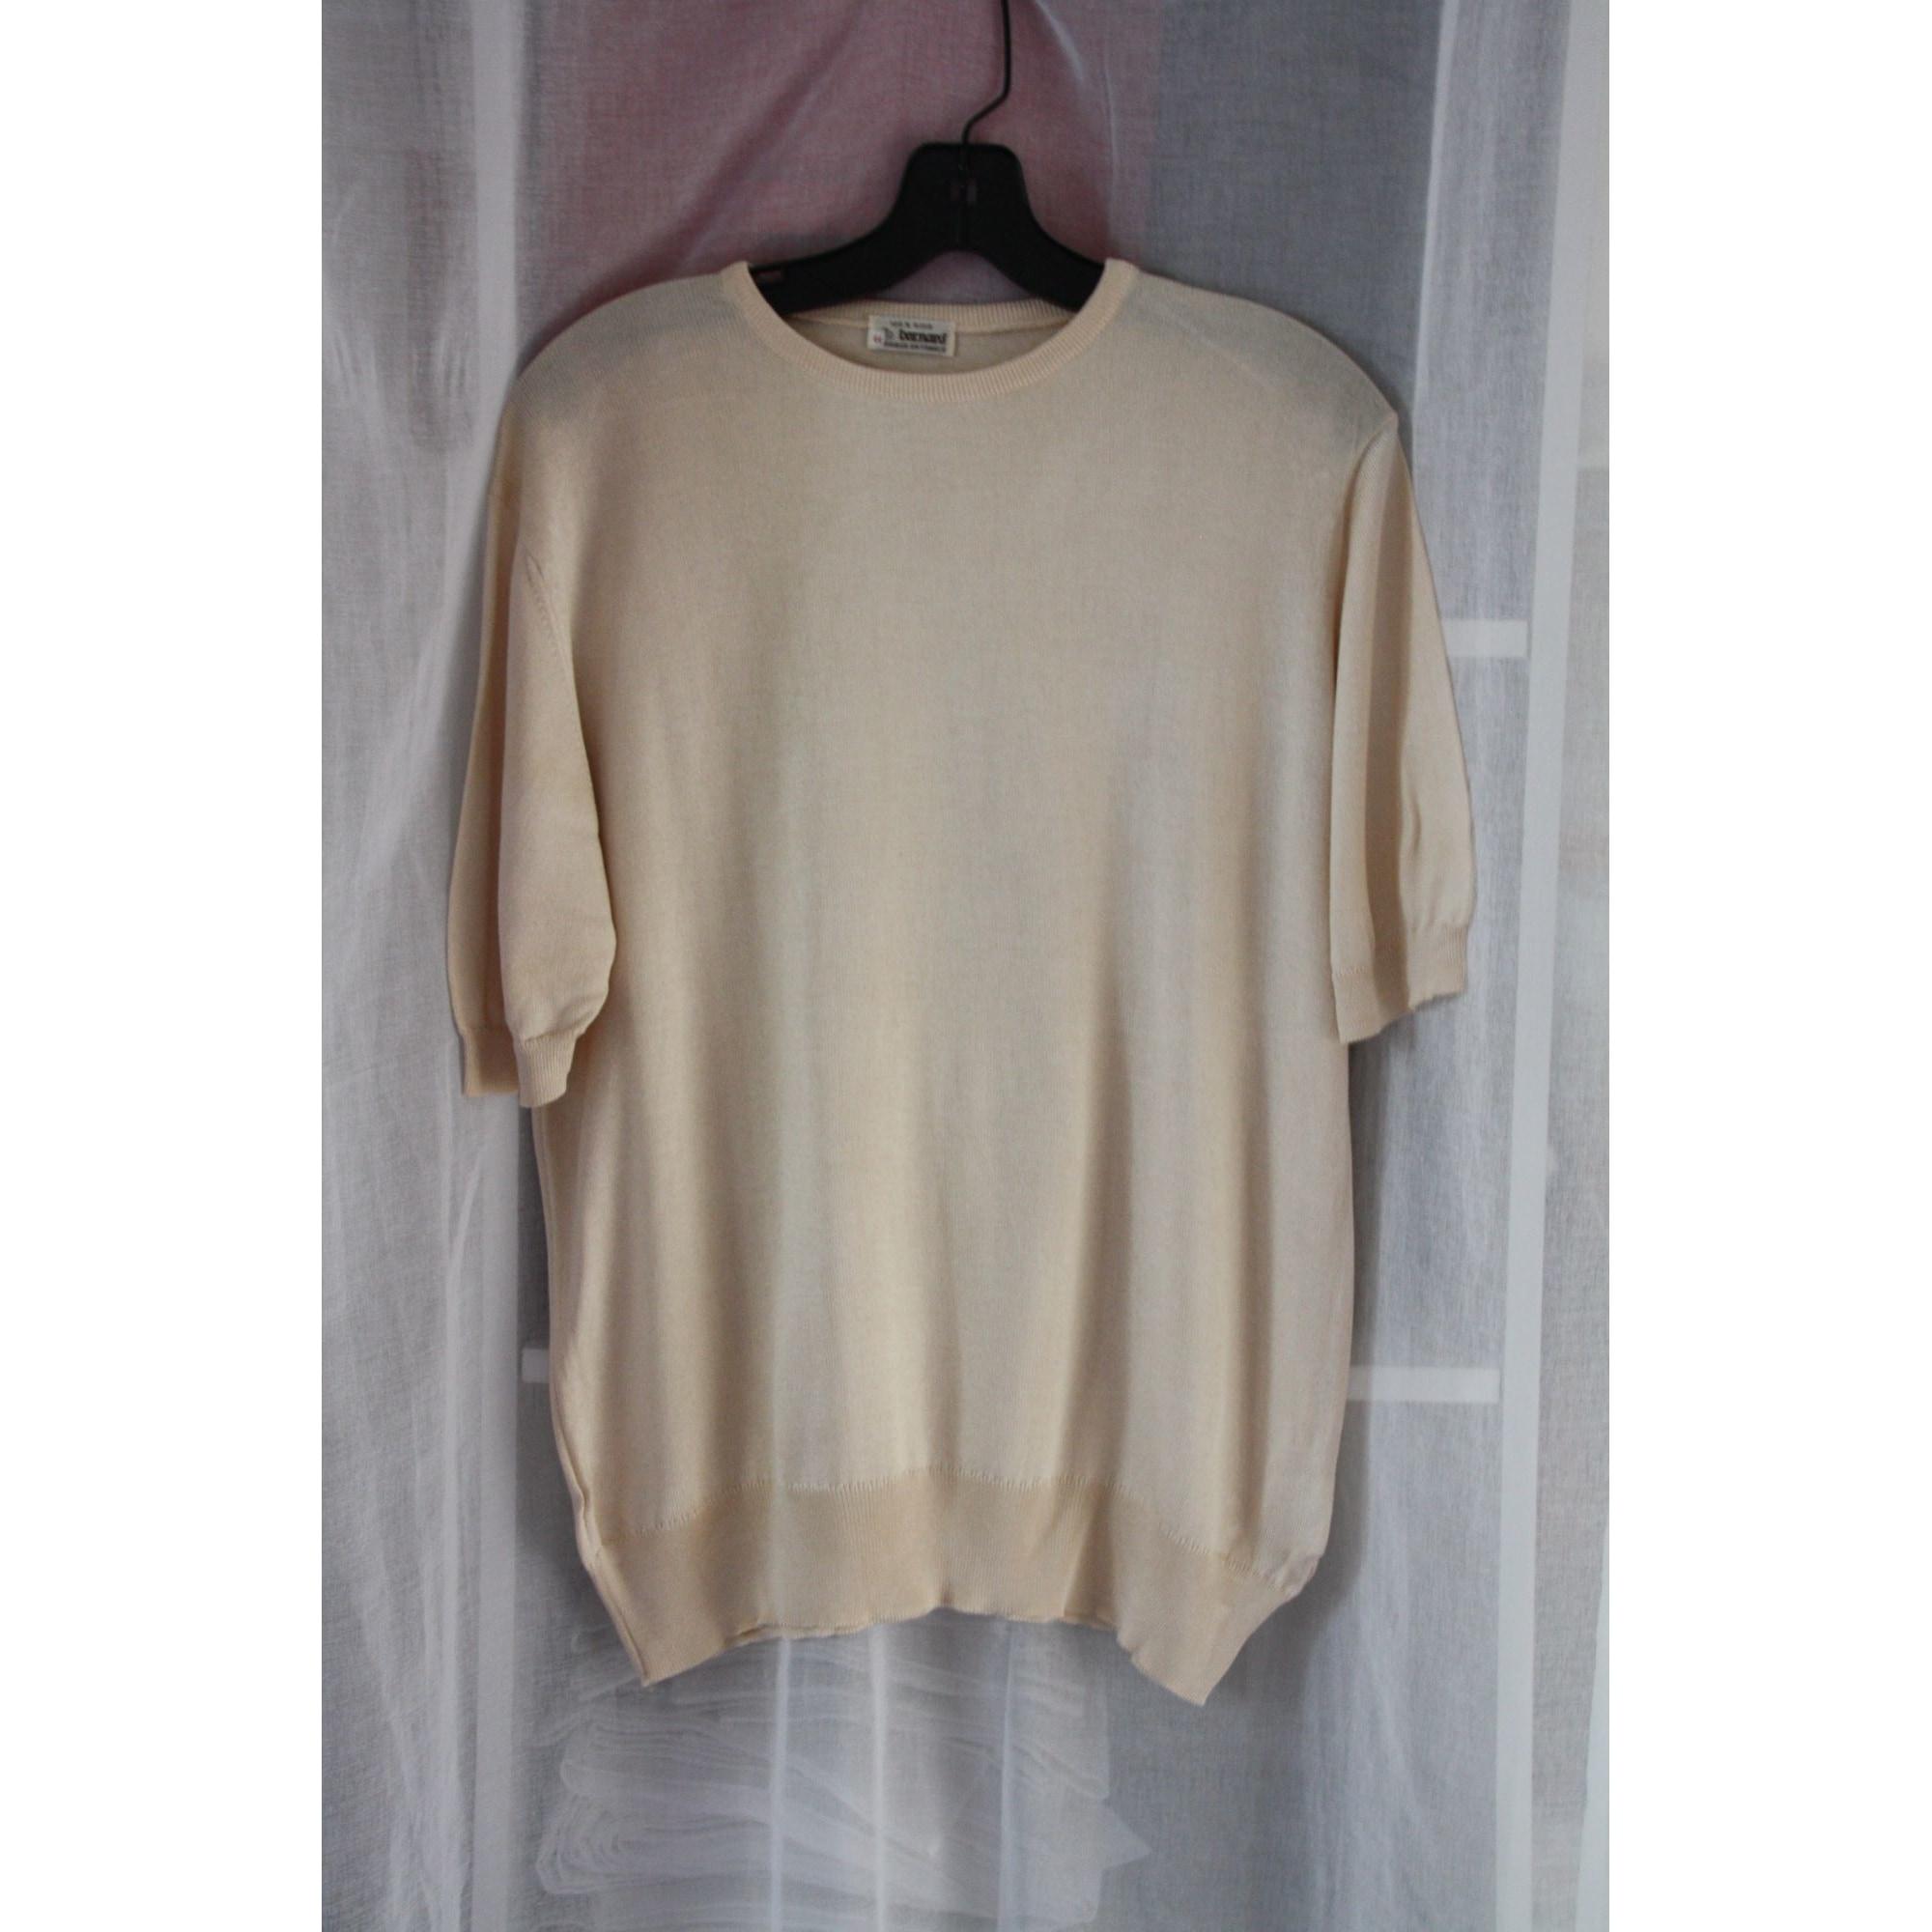 Top, tee-shirt BERNARD Blanc, blanc cassé, écru